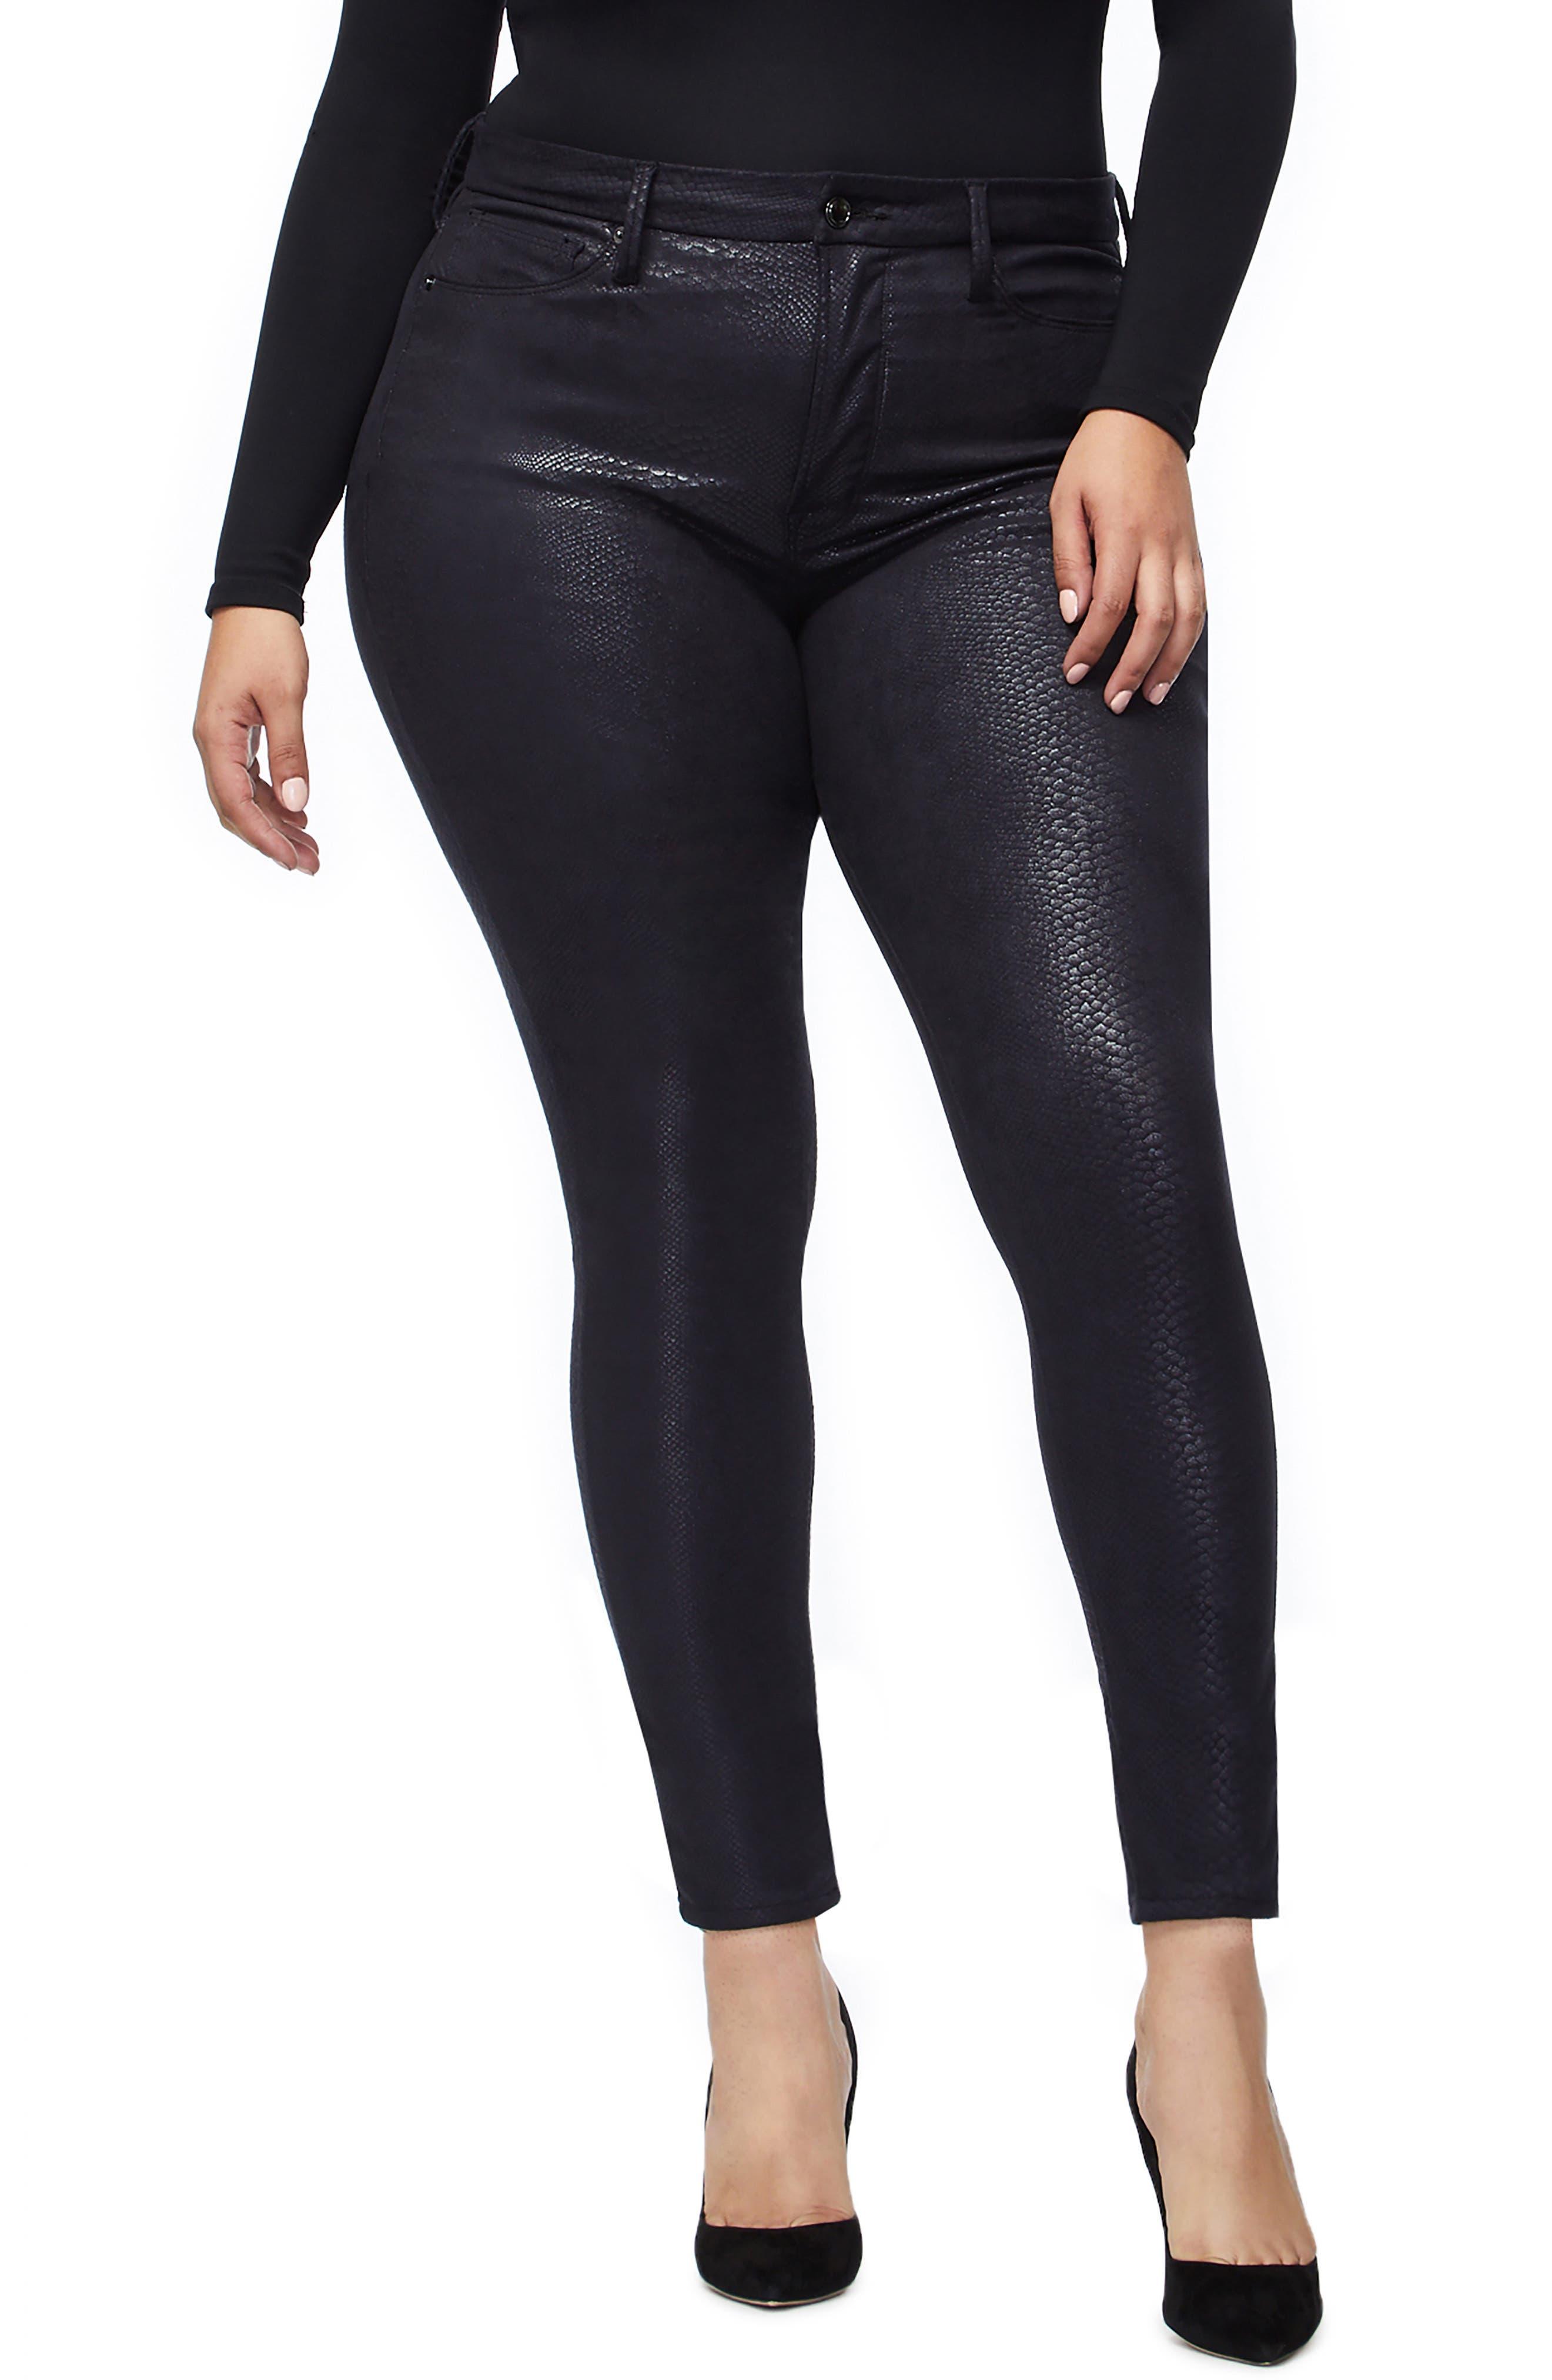 GOOD AMERICAN,                             Good Legs Metallic Snake Print Skinny Jeans,                             Alternate thumbnail 2, color,                             BLACK041